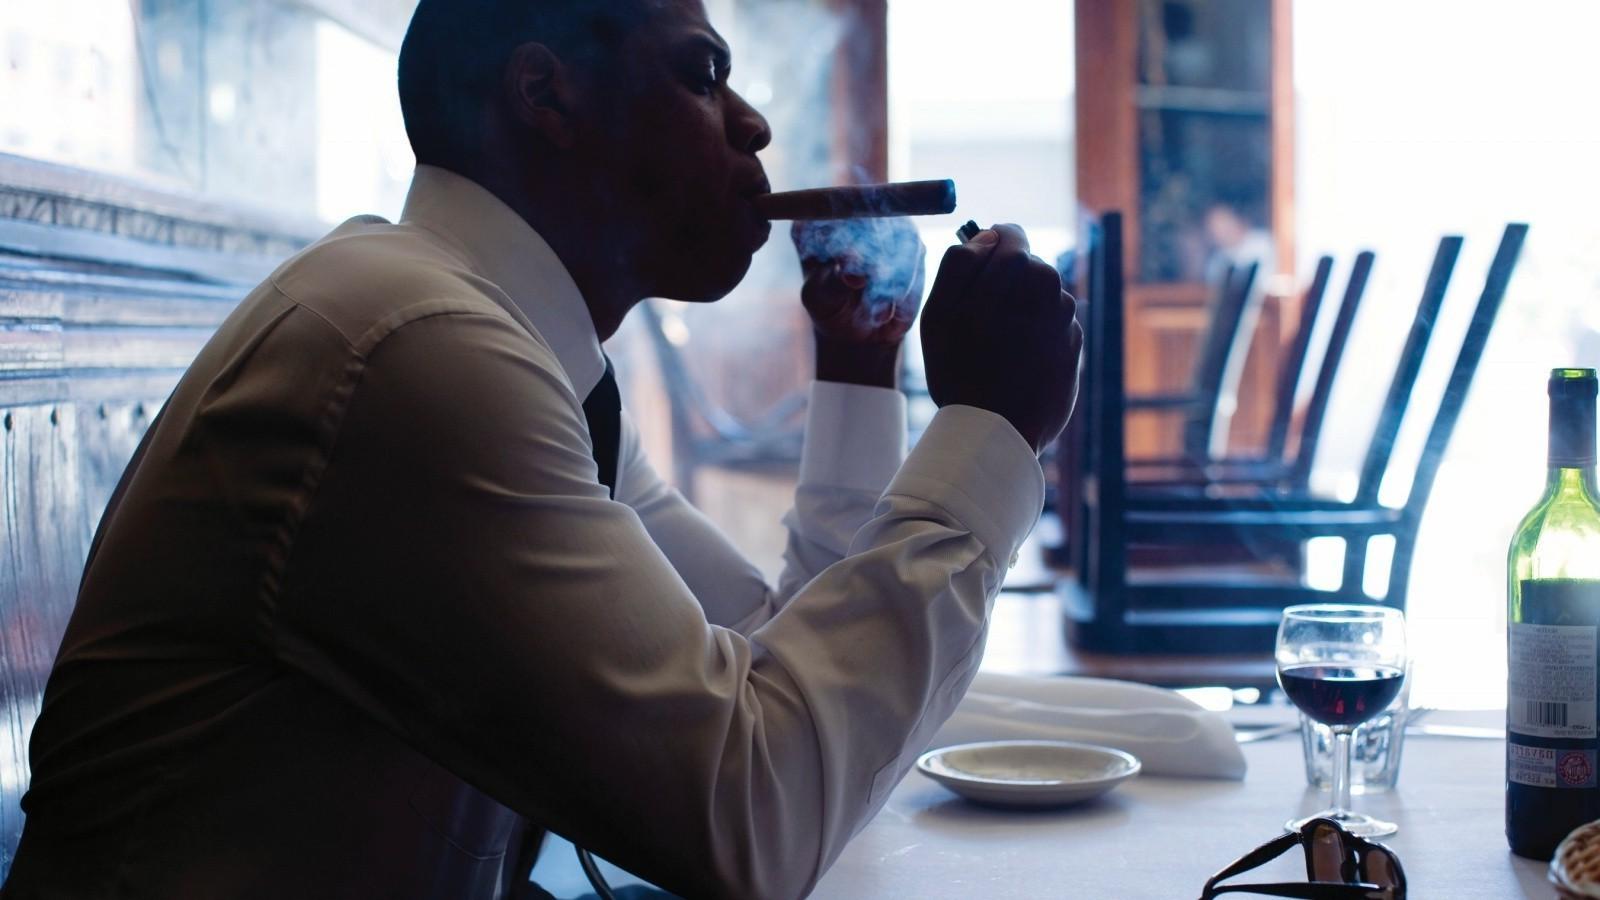 Fondos De Pantalla Hip Hop Rap Jay Z Costa Este